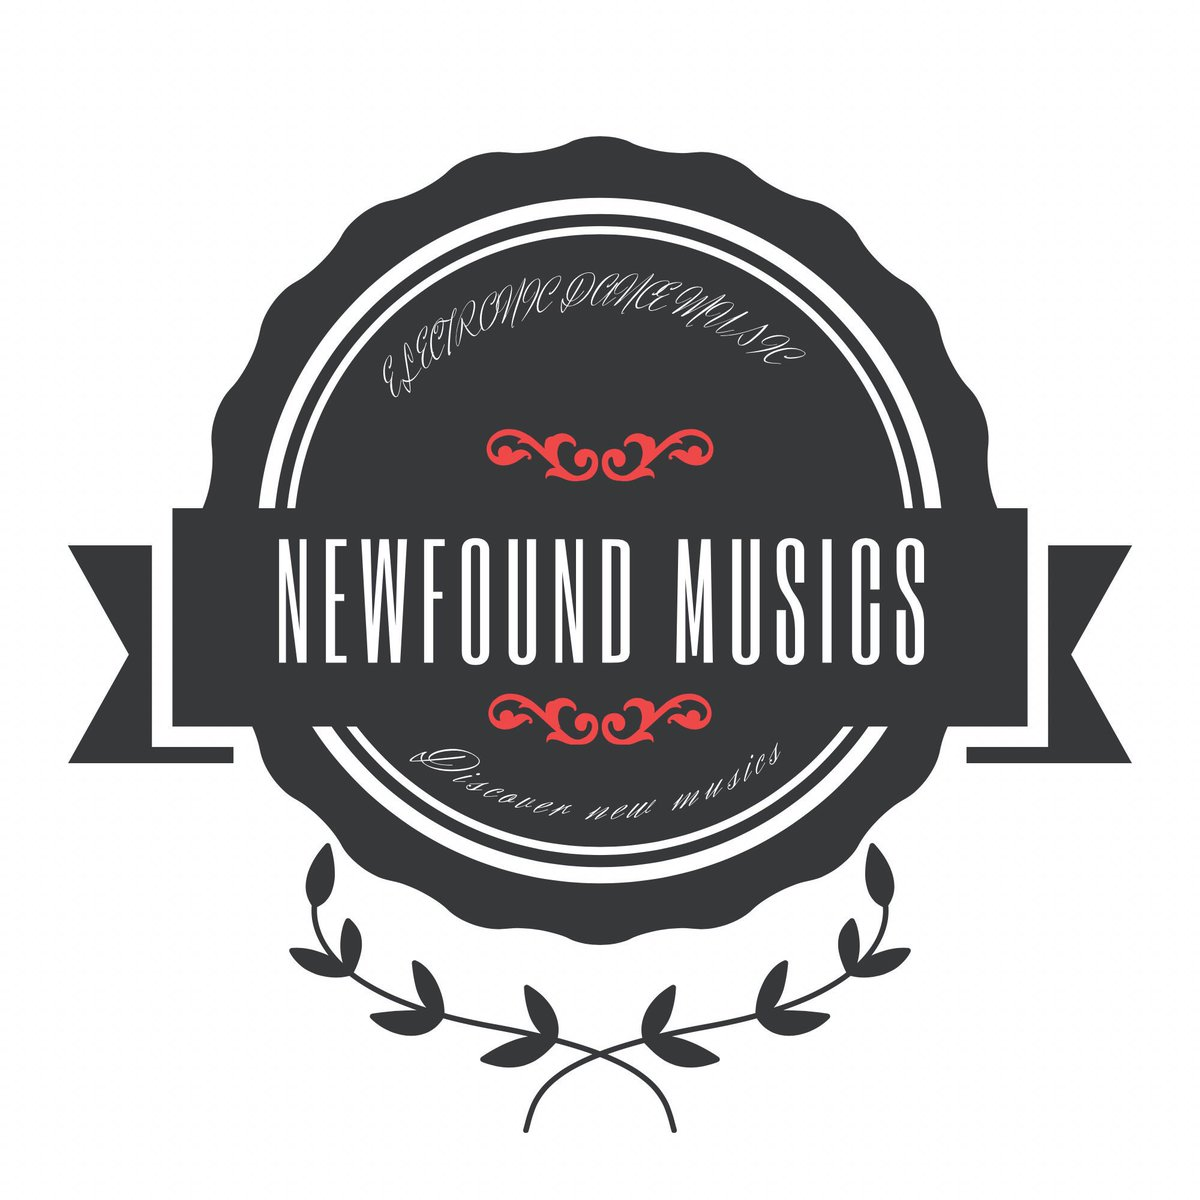 Newfound Musics - @MusicsNewfound Twitter Profile and